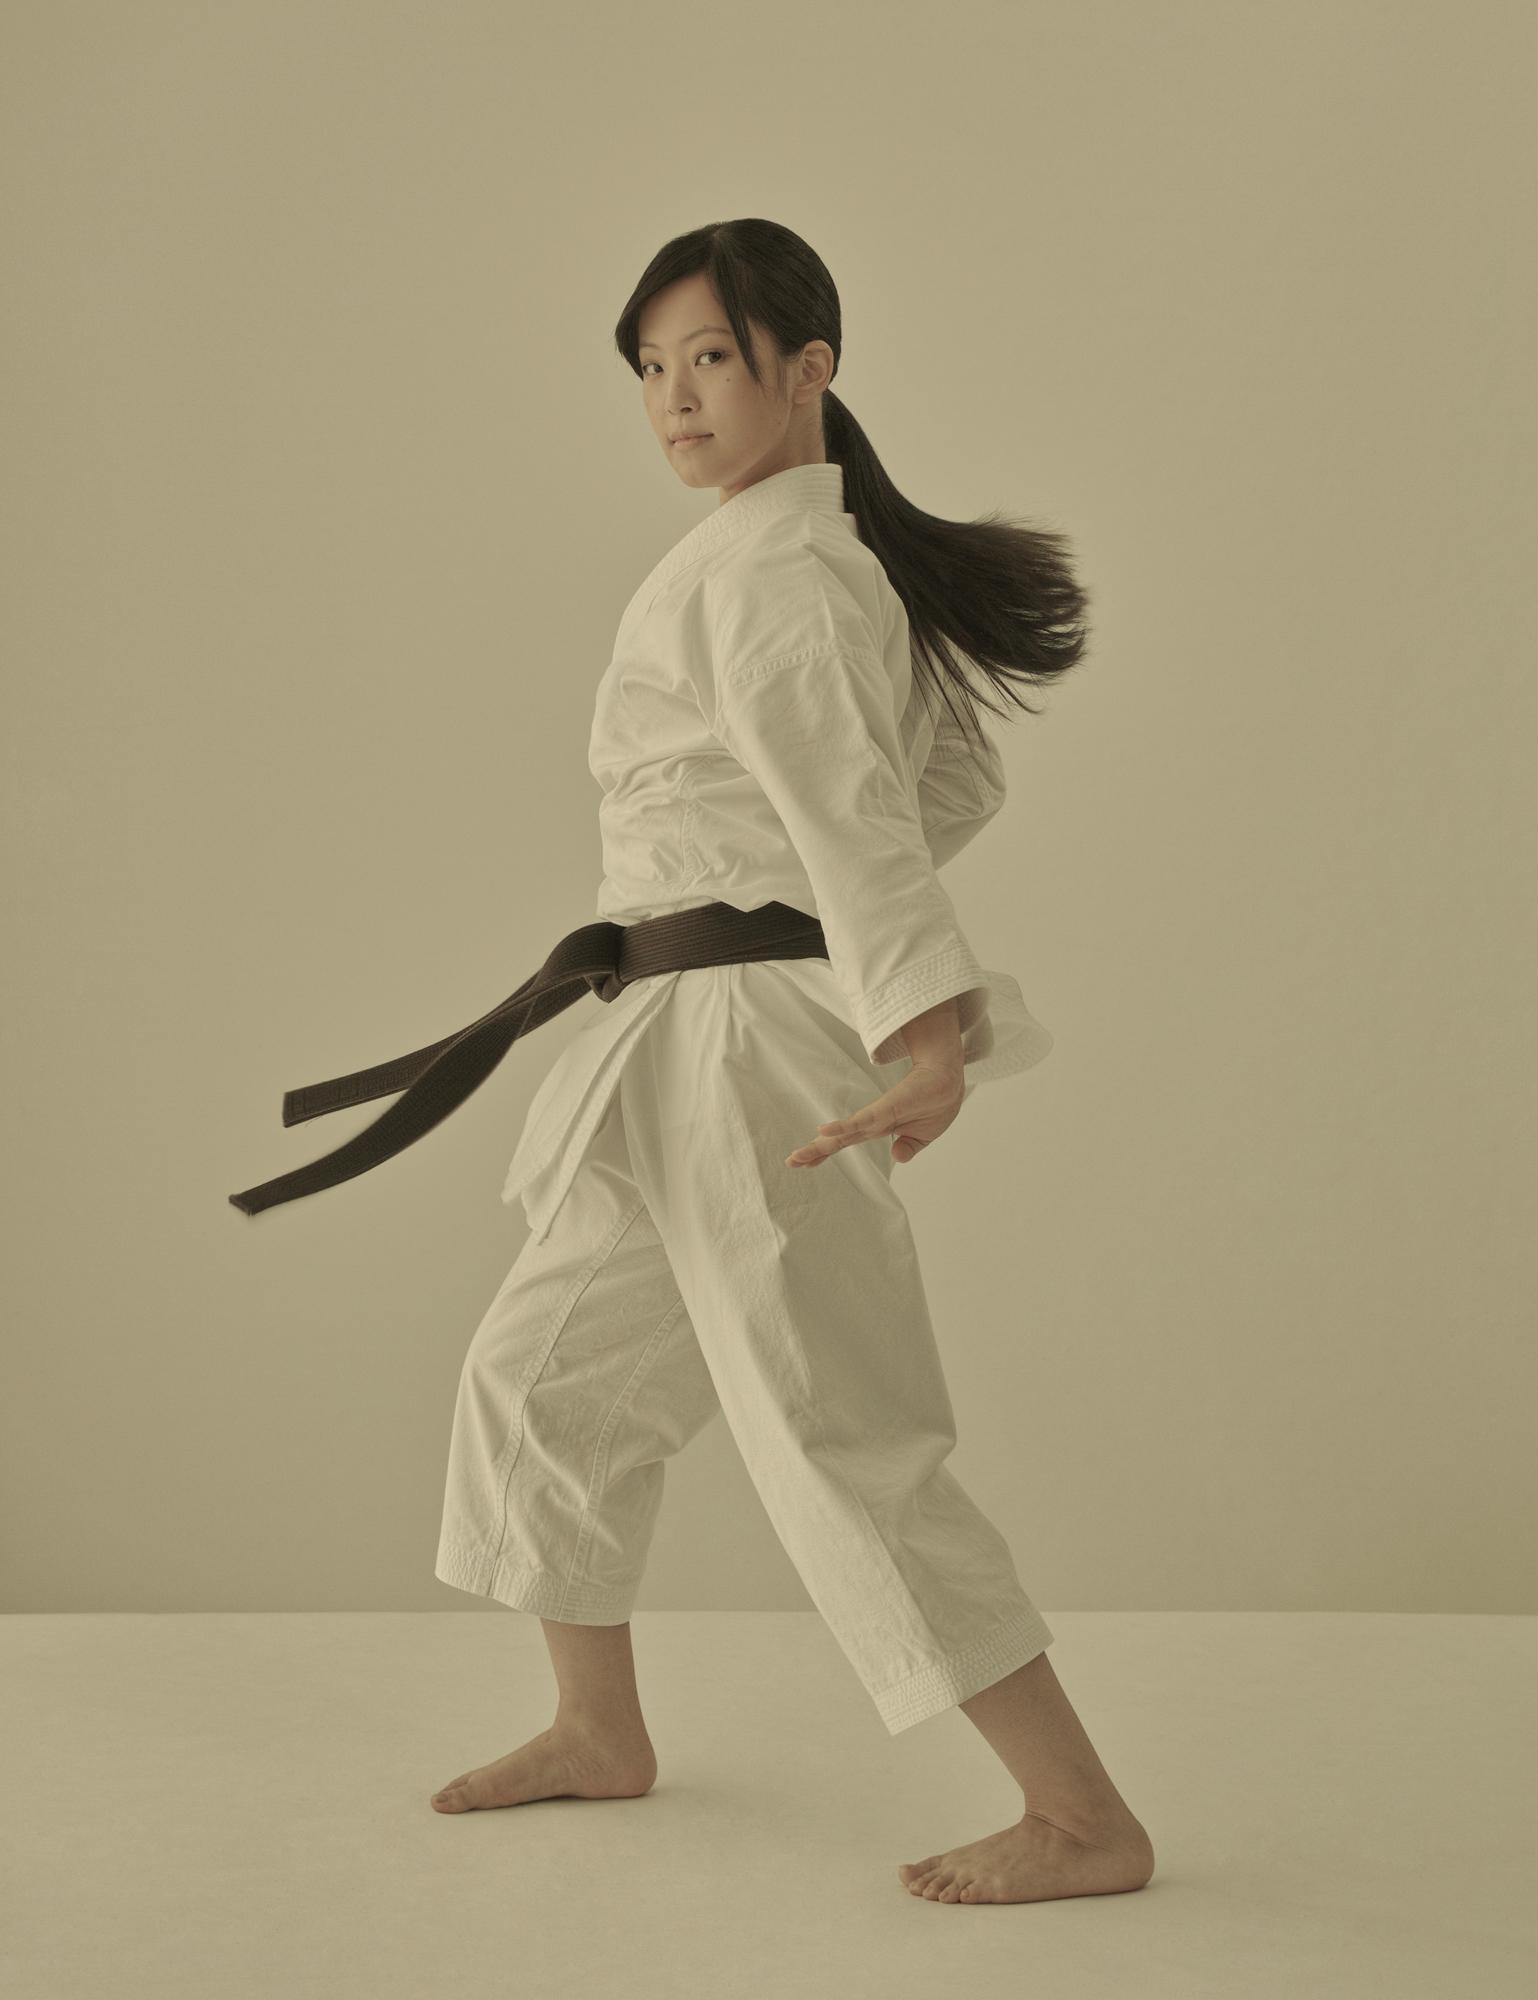 Karate practitioner